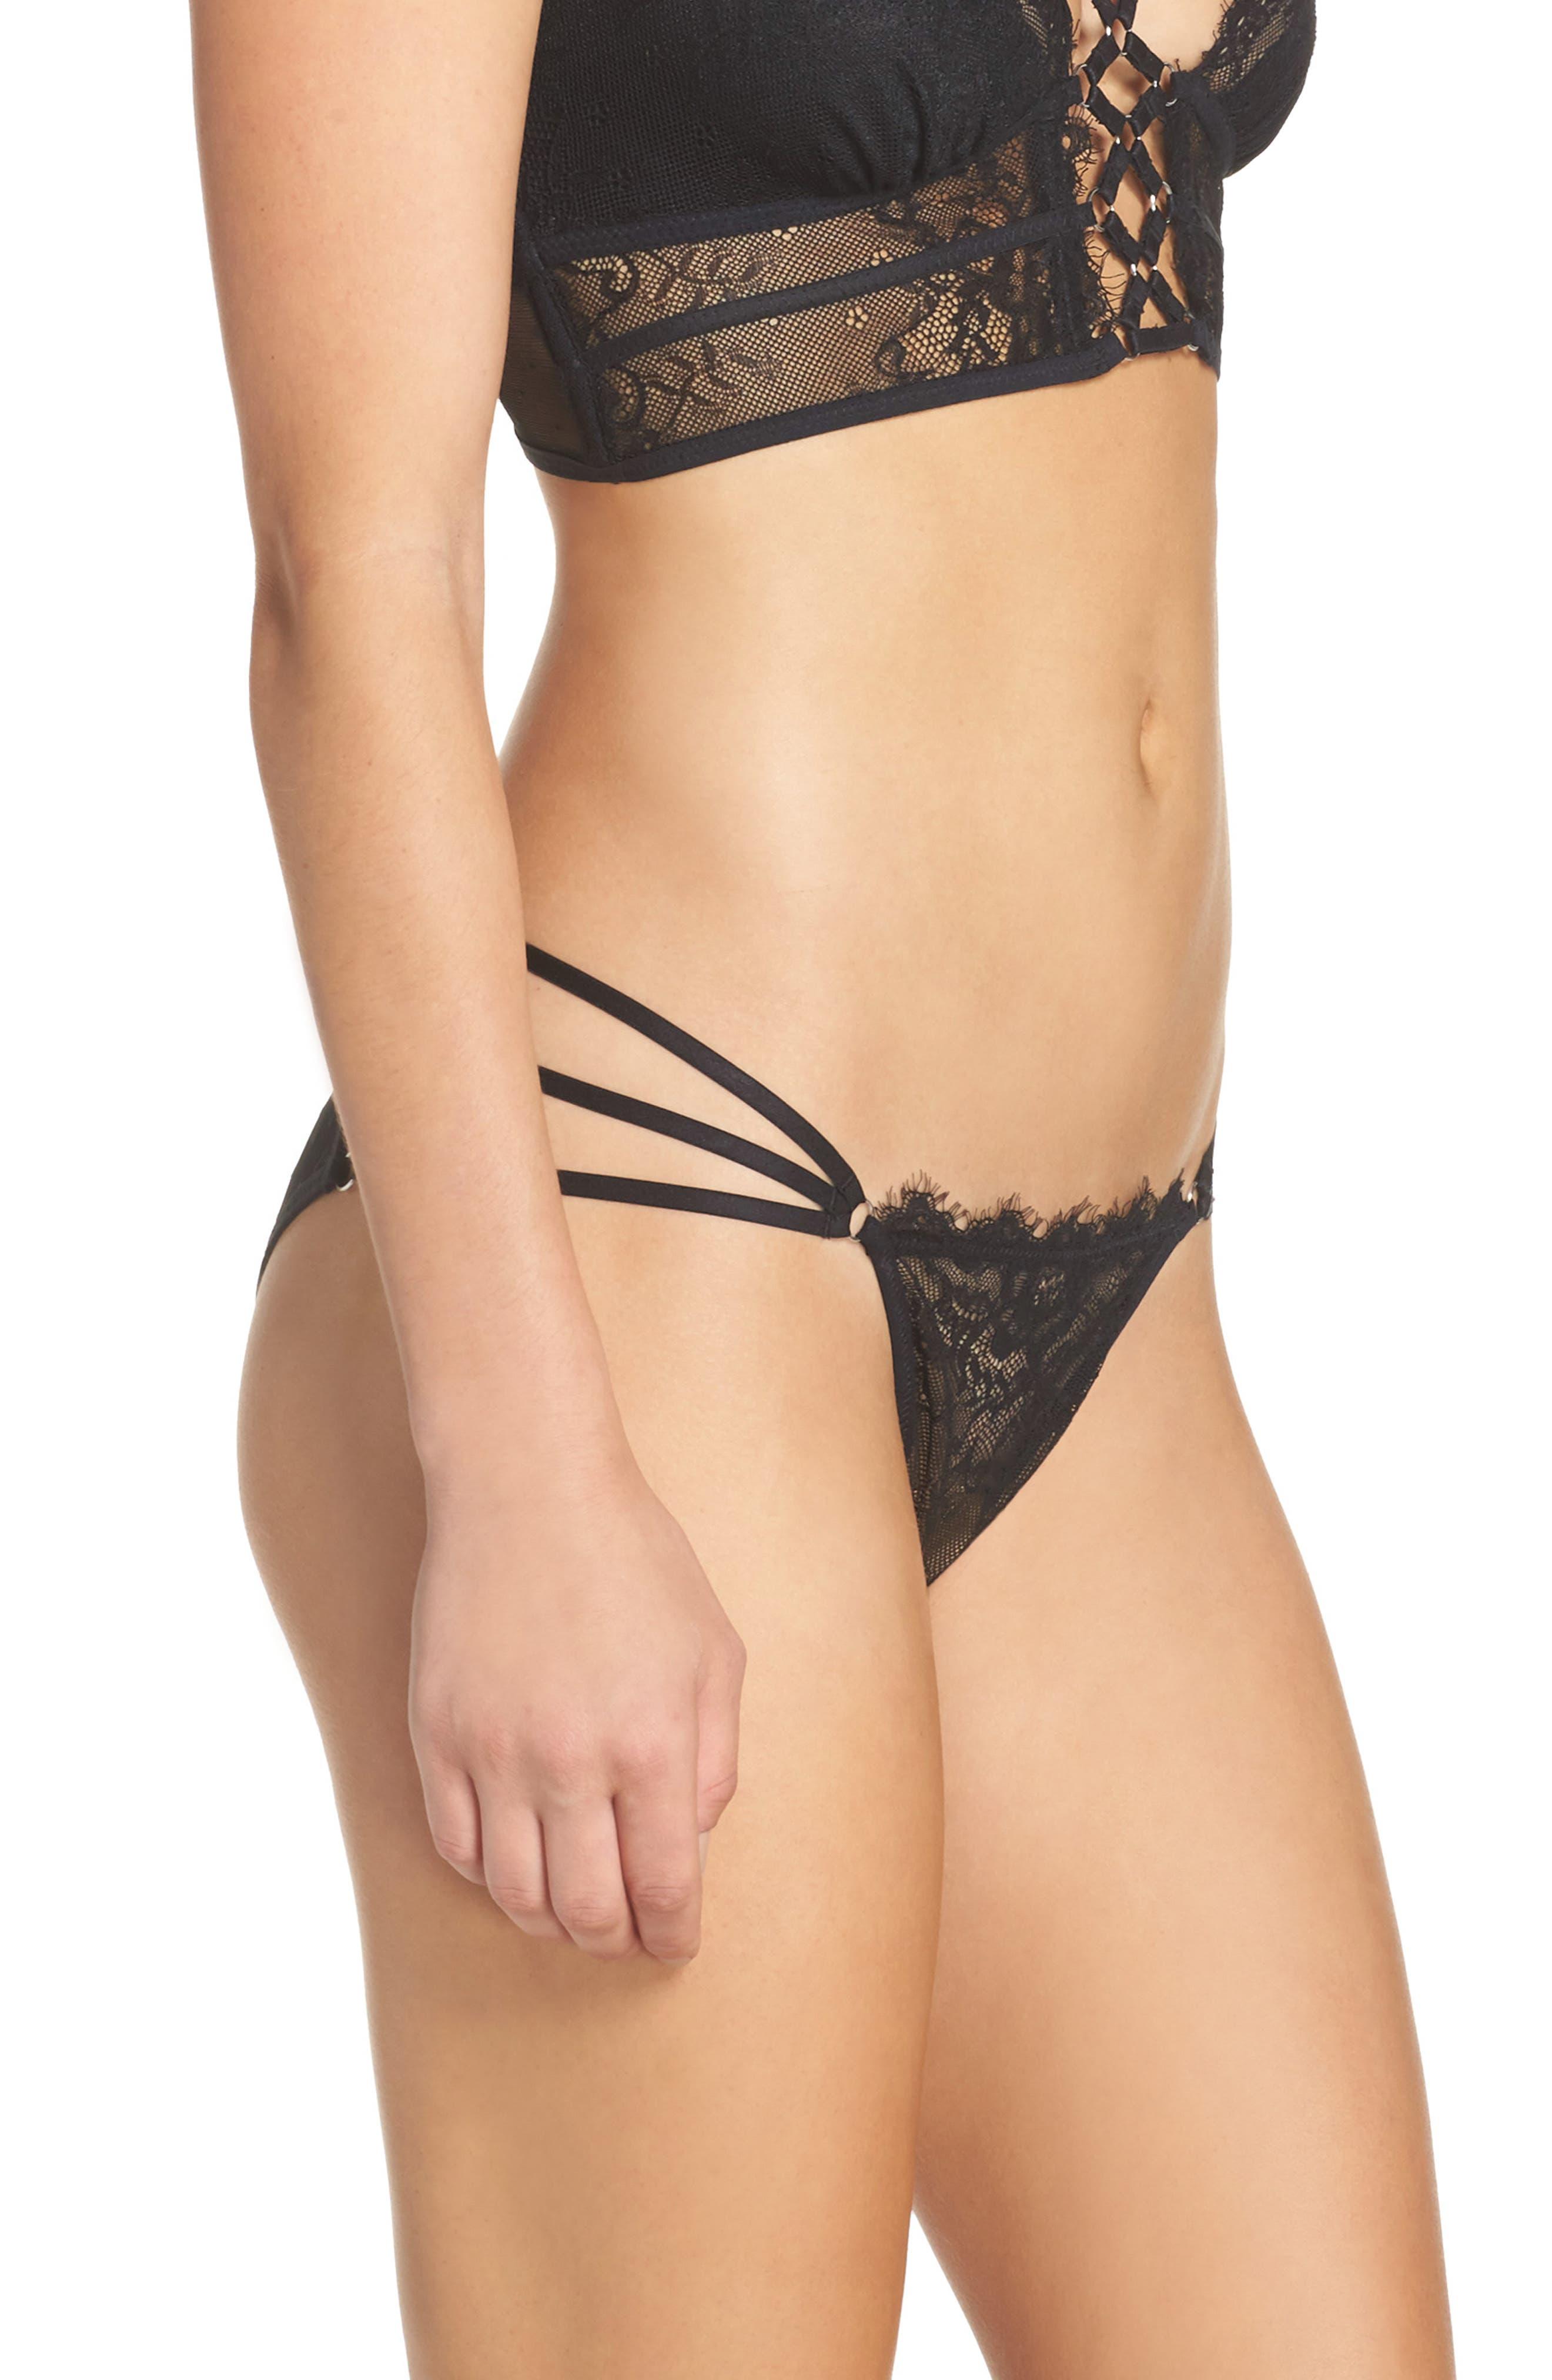 Constellation Lace Bikini,                             Alternate thumbnail 3, color,                             001